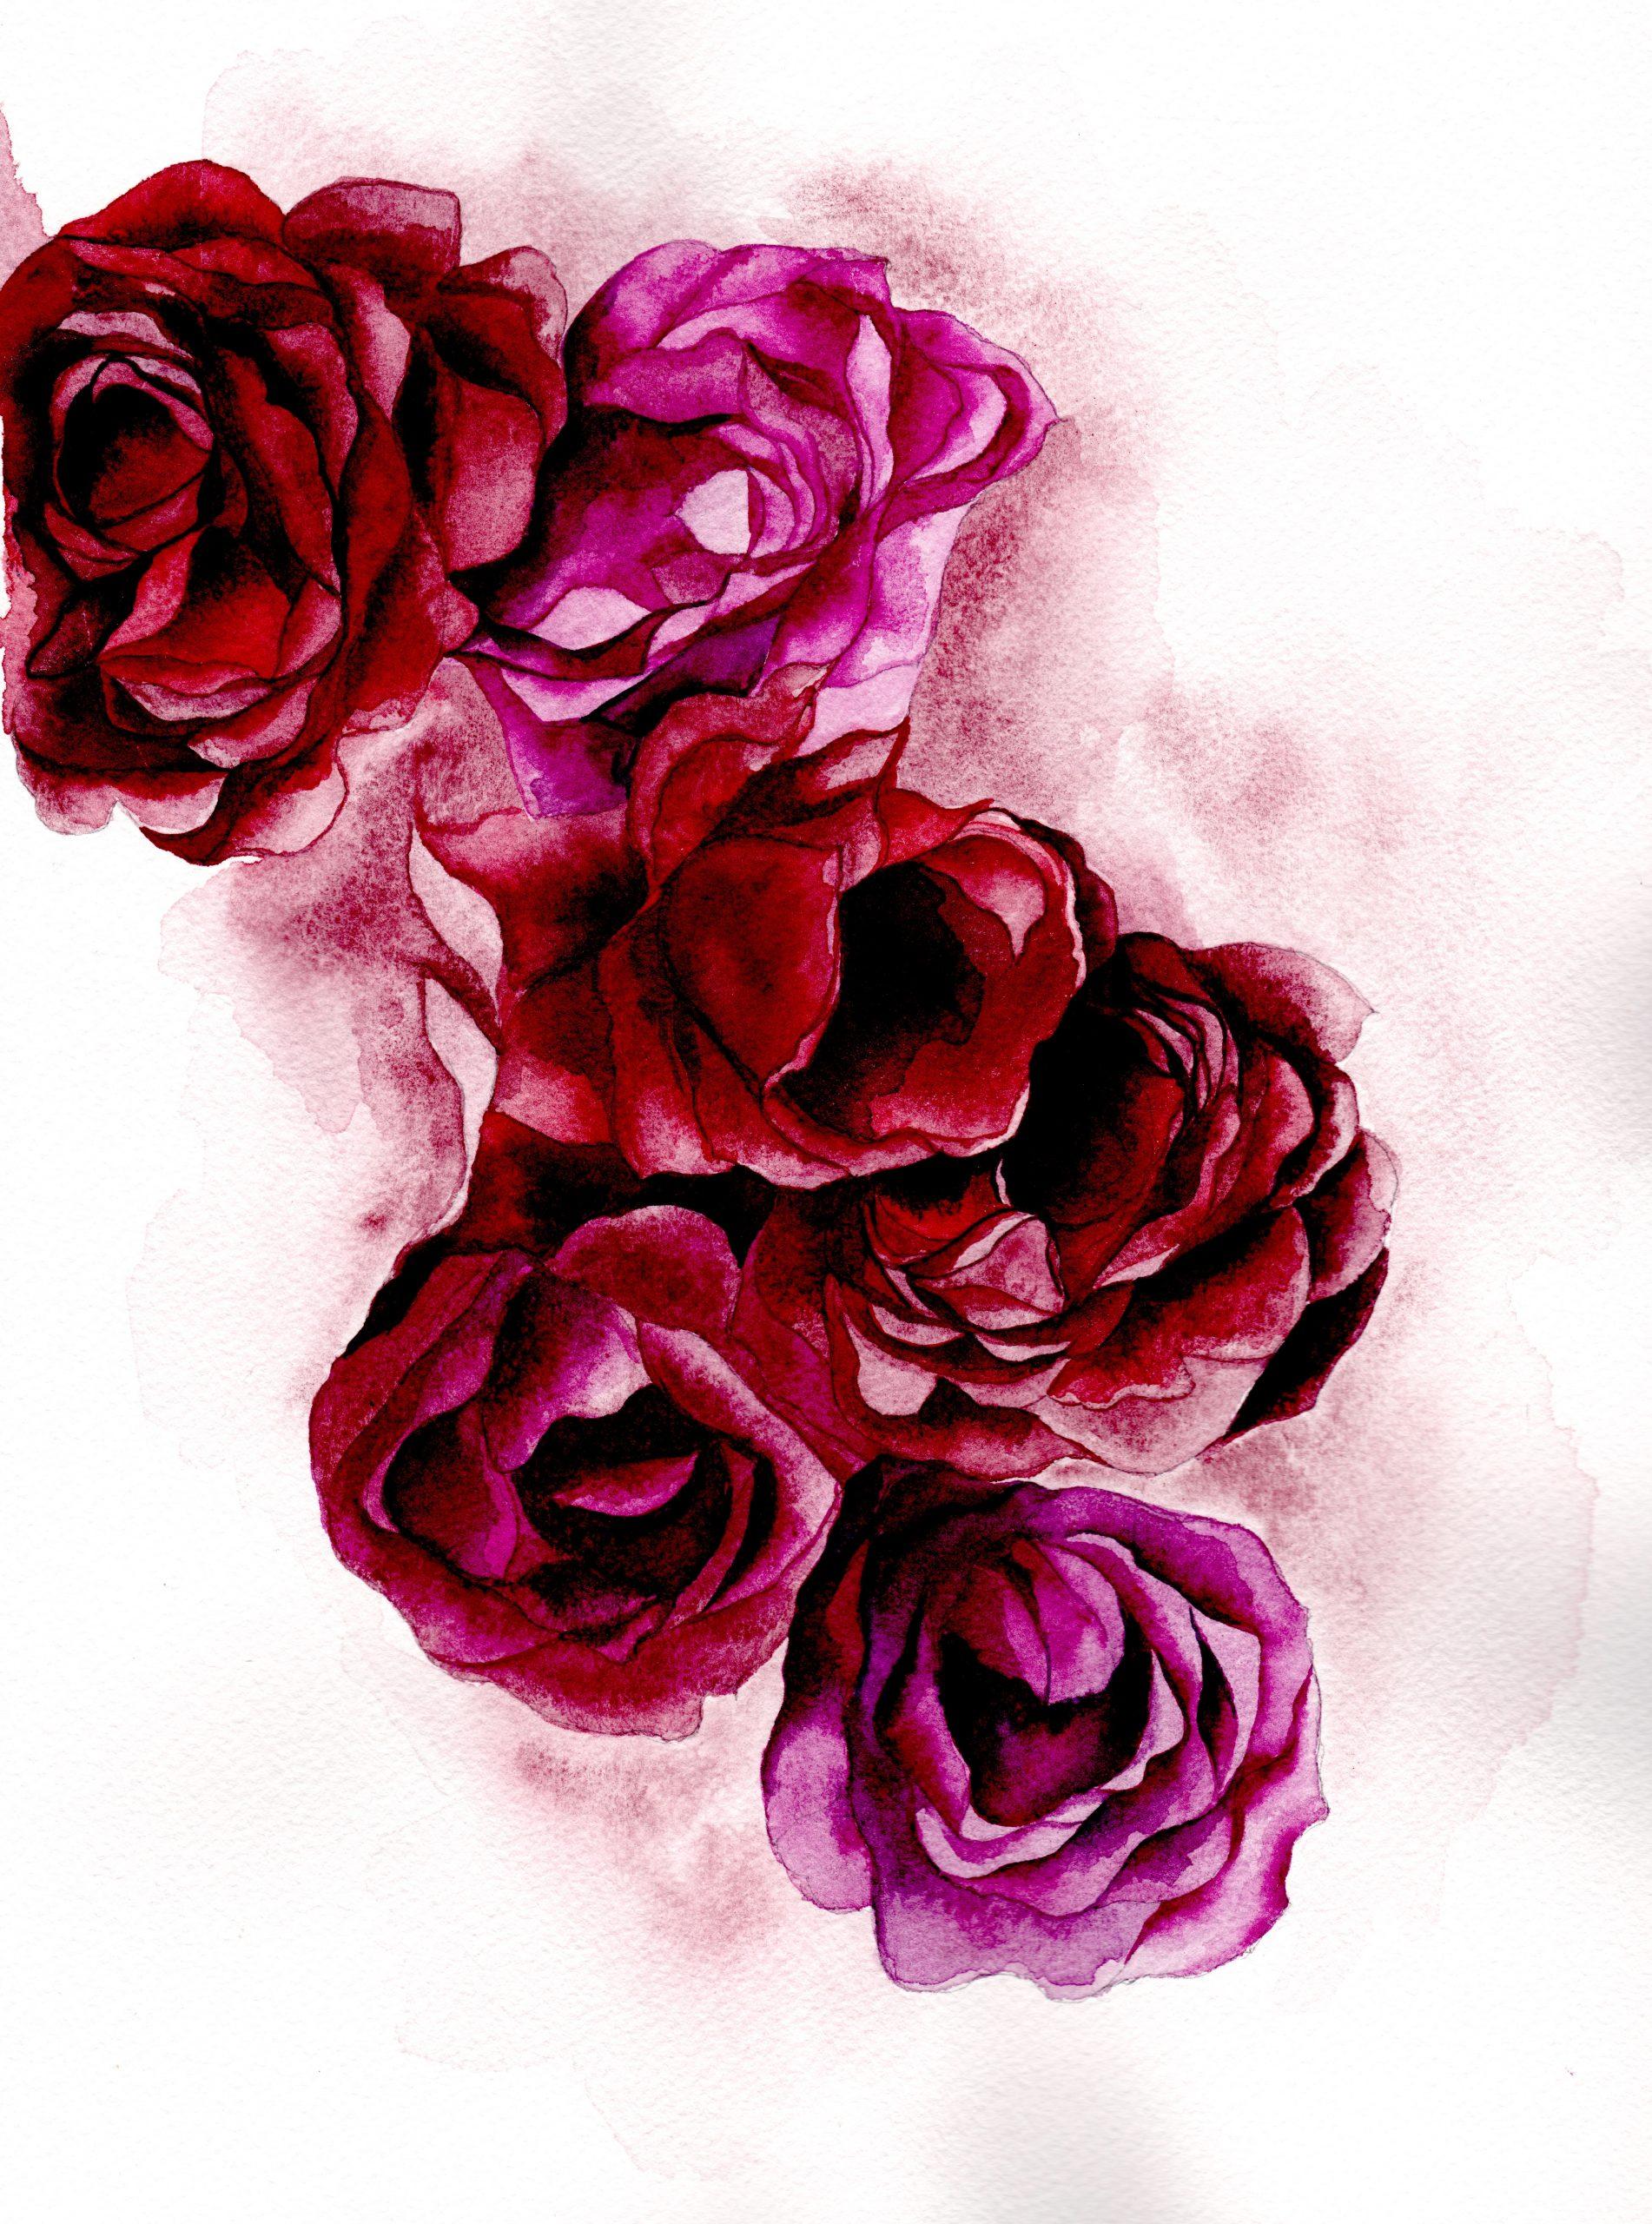 Rose watercolour illustration